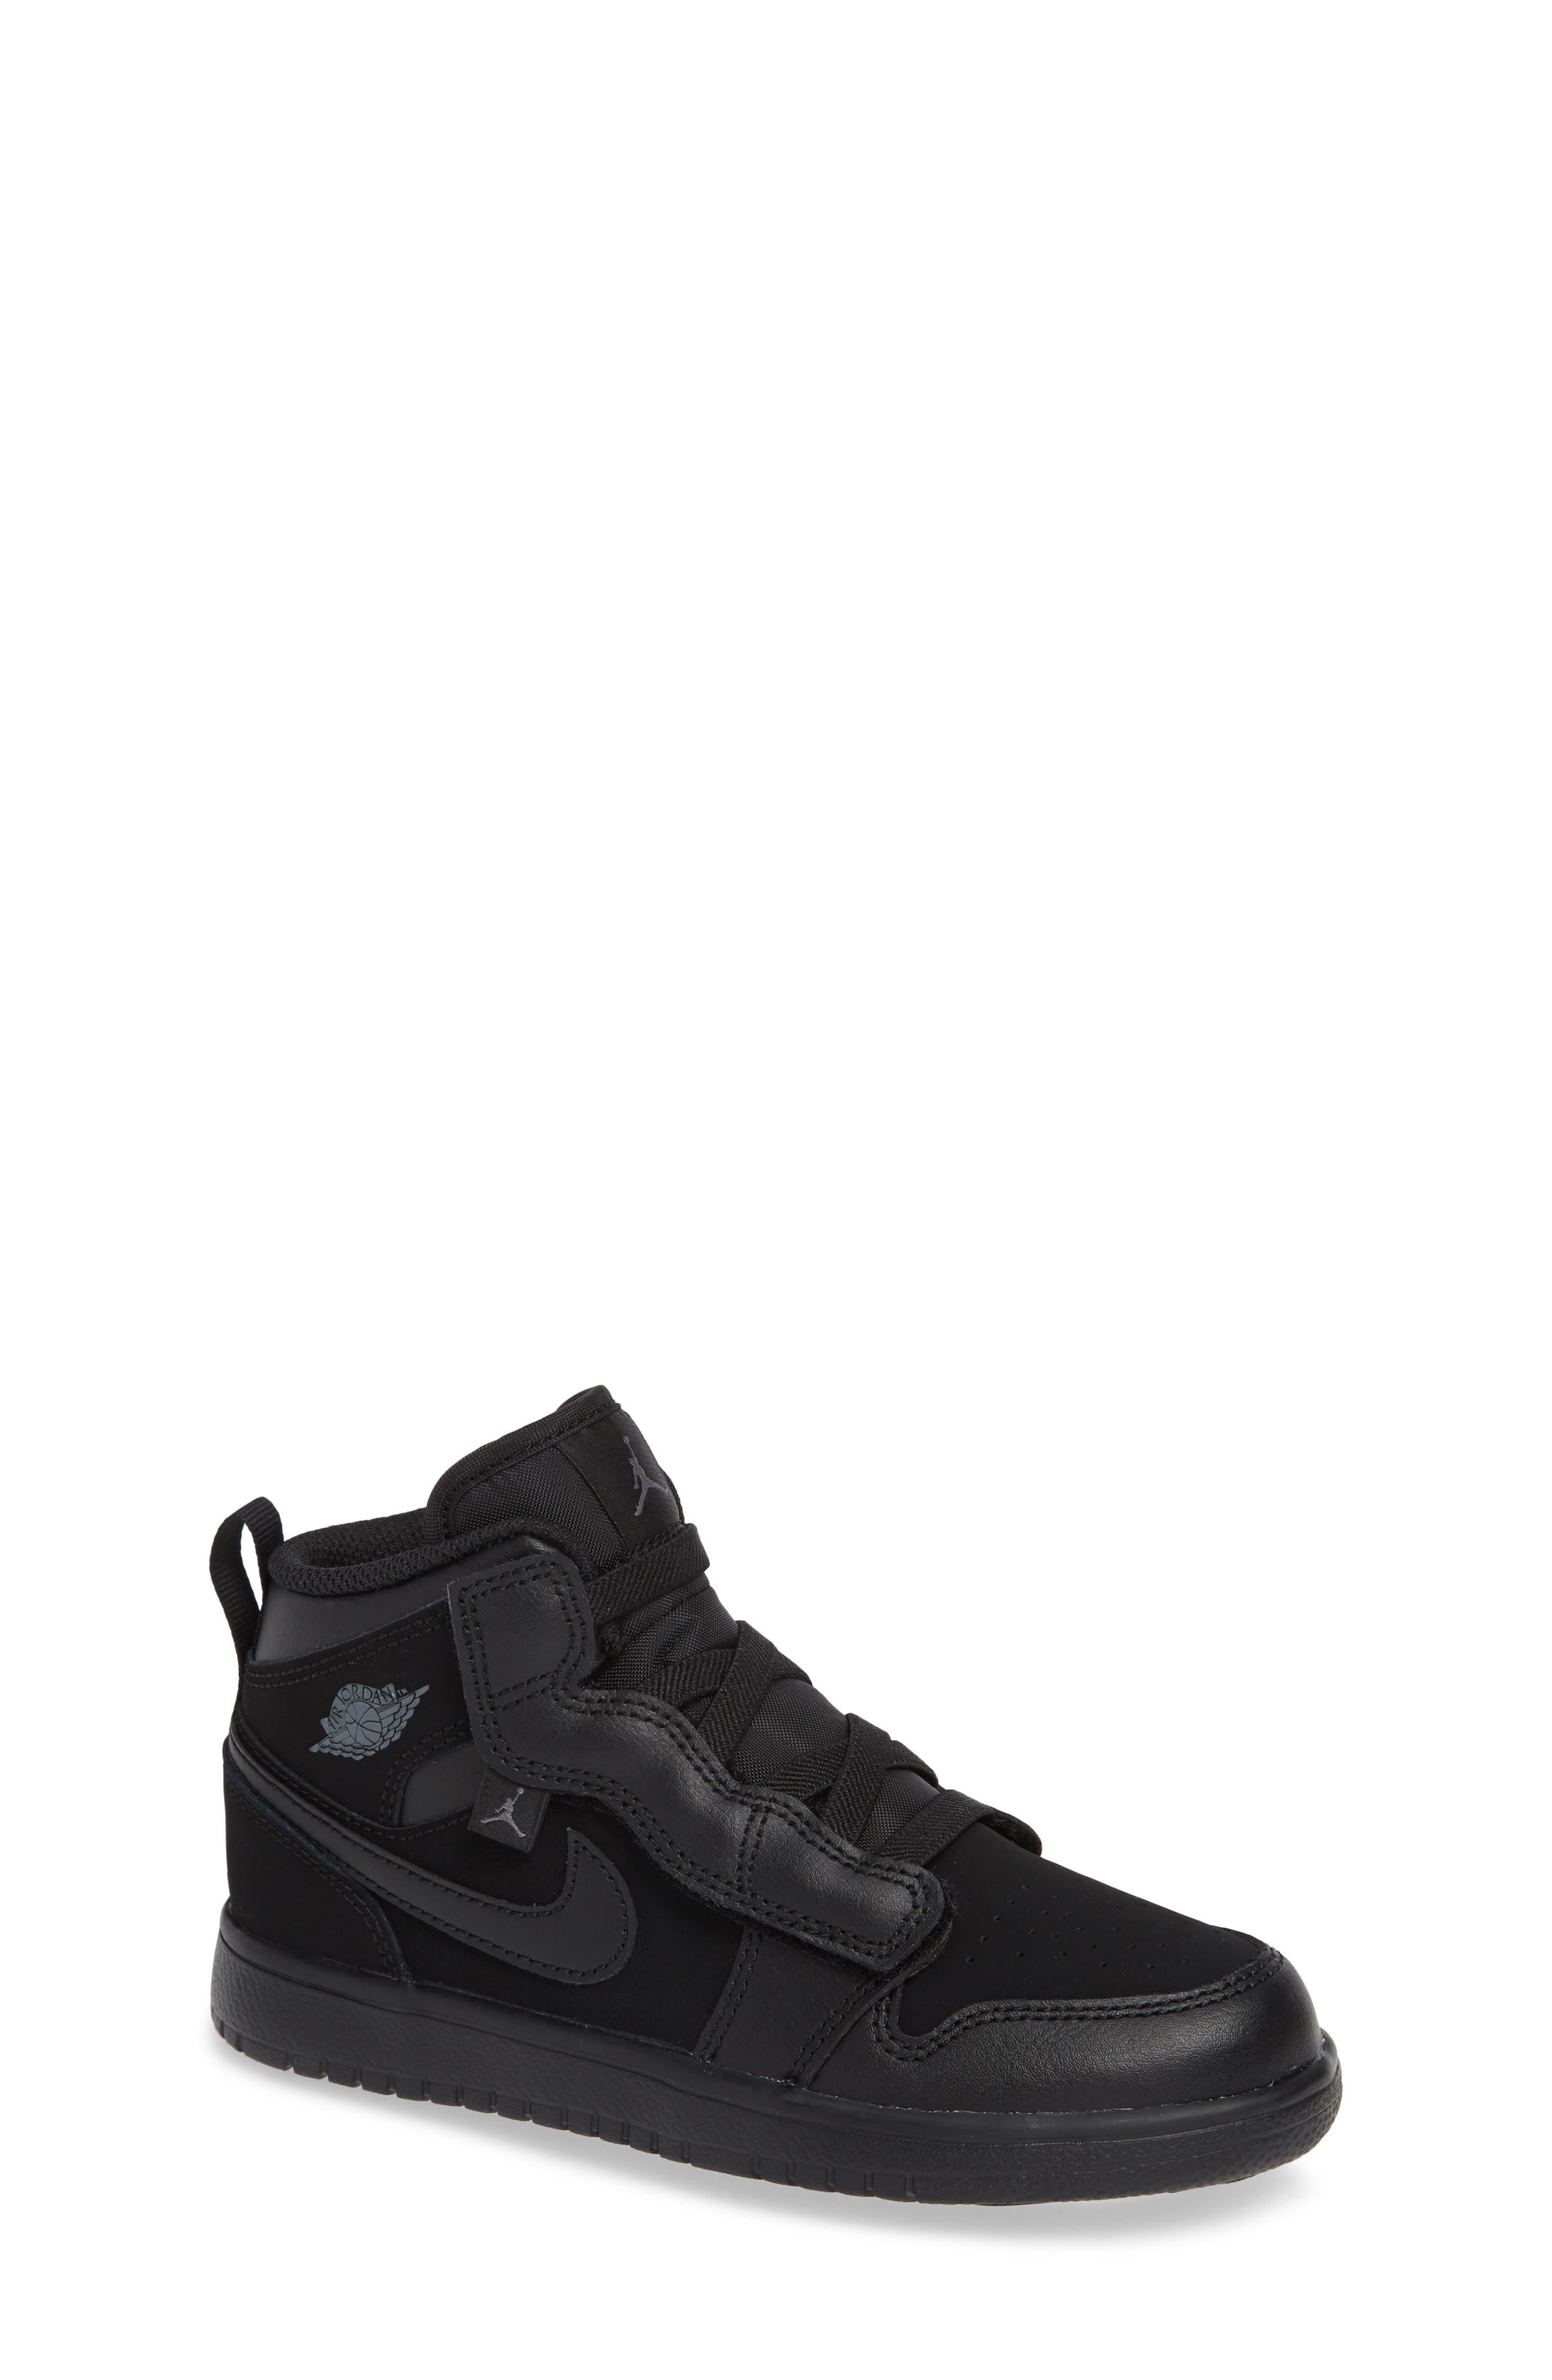 JORDAN, 1 Mid Basketball Shoe, Main thumbnail 1, color, BLACK/ DARK GREY